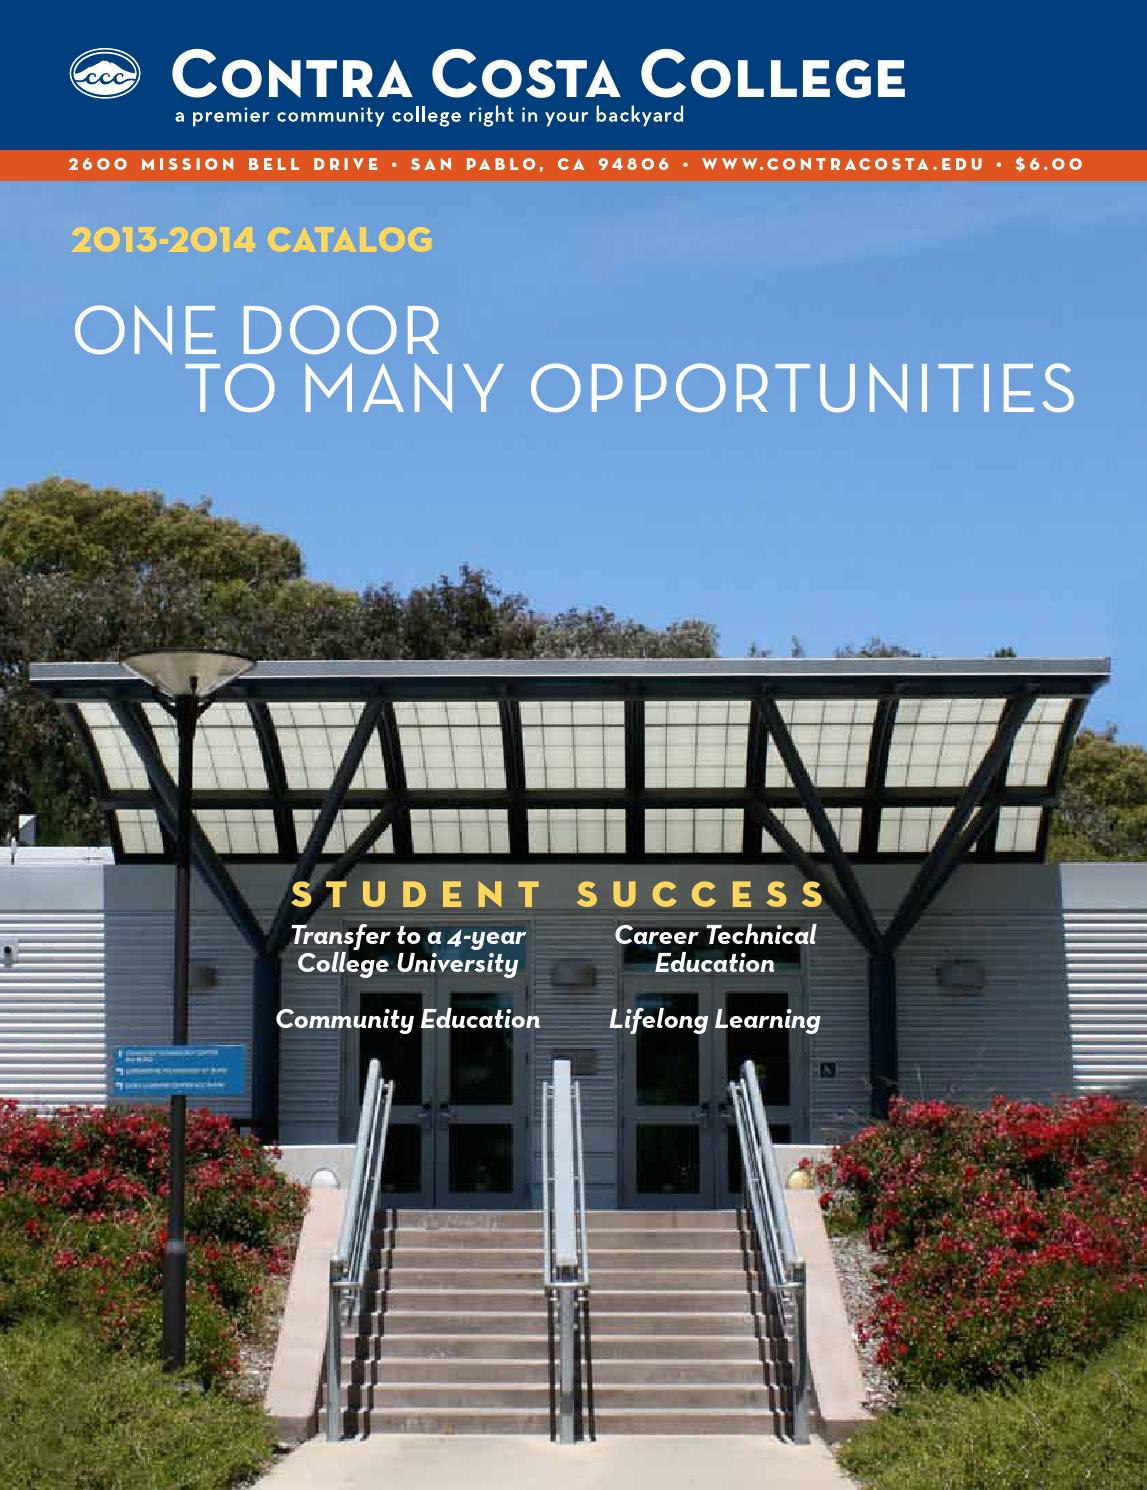 Contra Costa College Catalog 2013-2014 by Contra Costa College - issuu